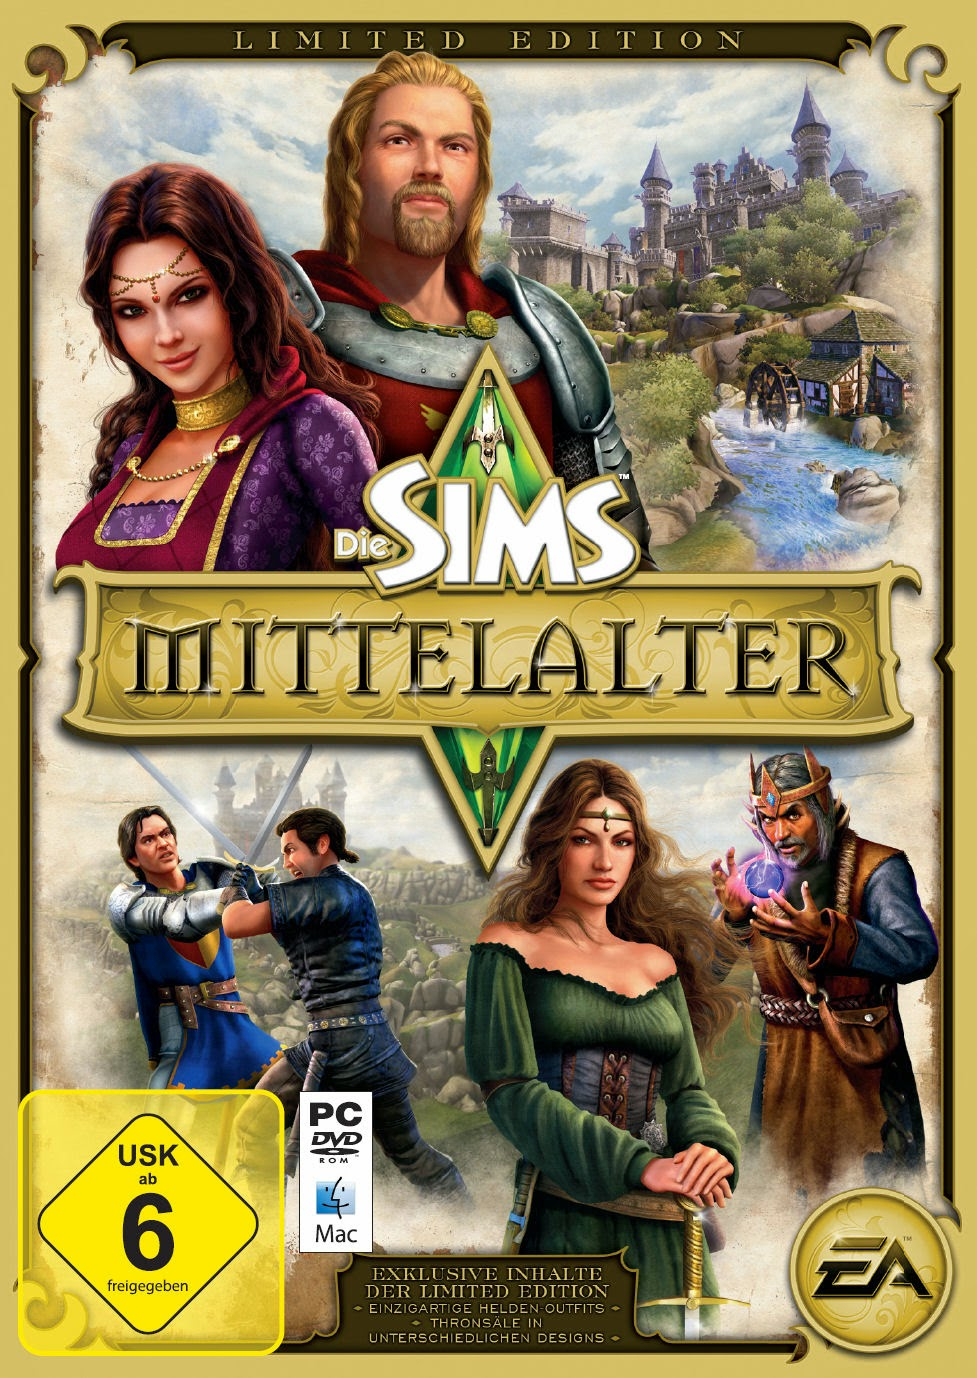 http://www.amazon.de/Electronic-Arts-Die-Sims-Mittelalter/dp/B003RWS6CM/ref=sr_1_2?ie=UTF8&qid=1406034635&sr=8-2&keywords=die+sims+mittelalter